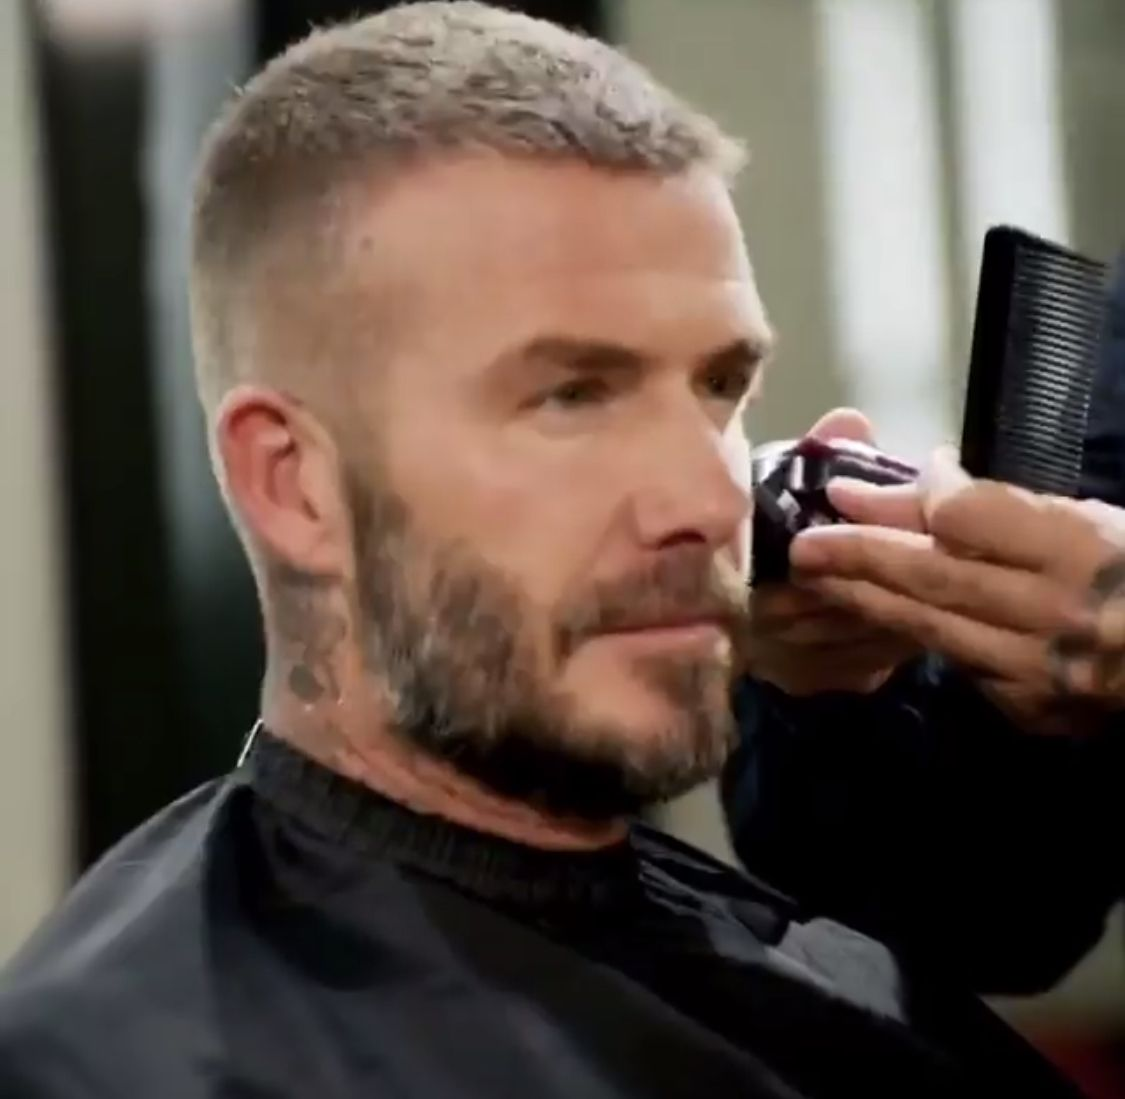 Pin By David Beckham On David Beckham Beckham Hair Beckham Haircut David Beckham Haircut